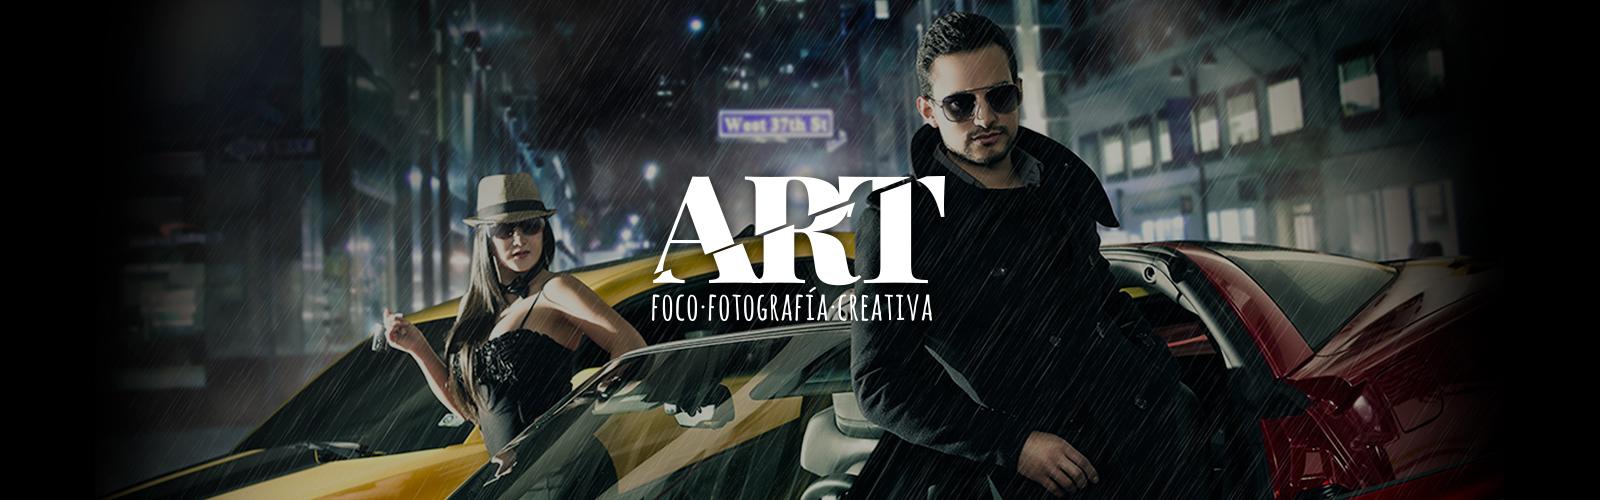 Art Fotografia Creativa